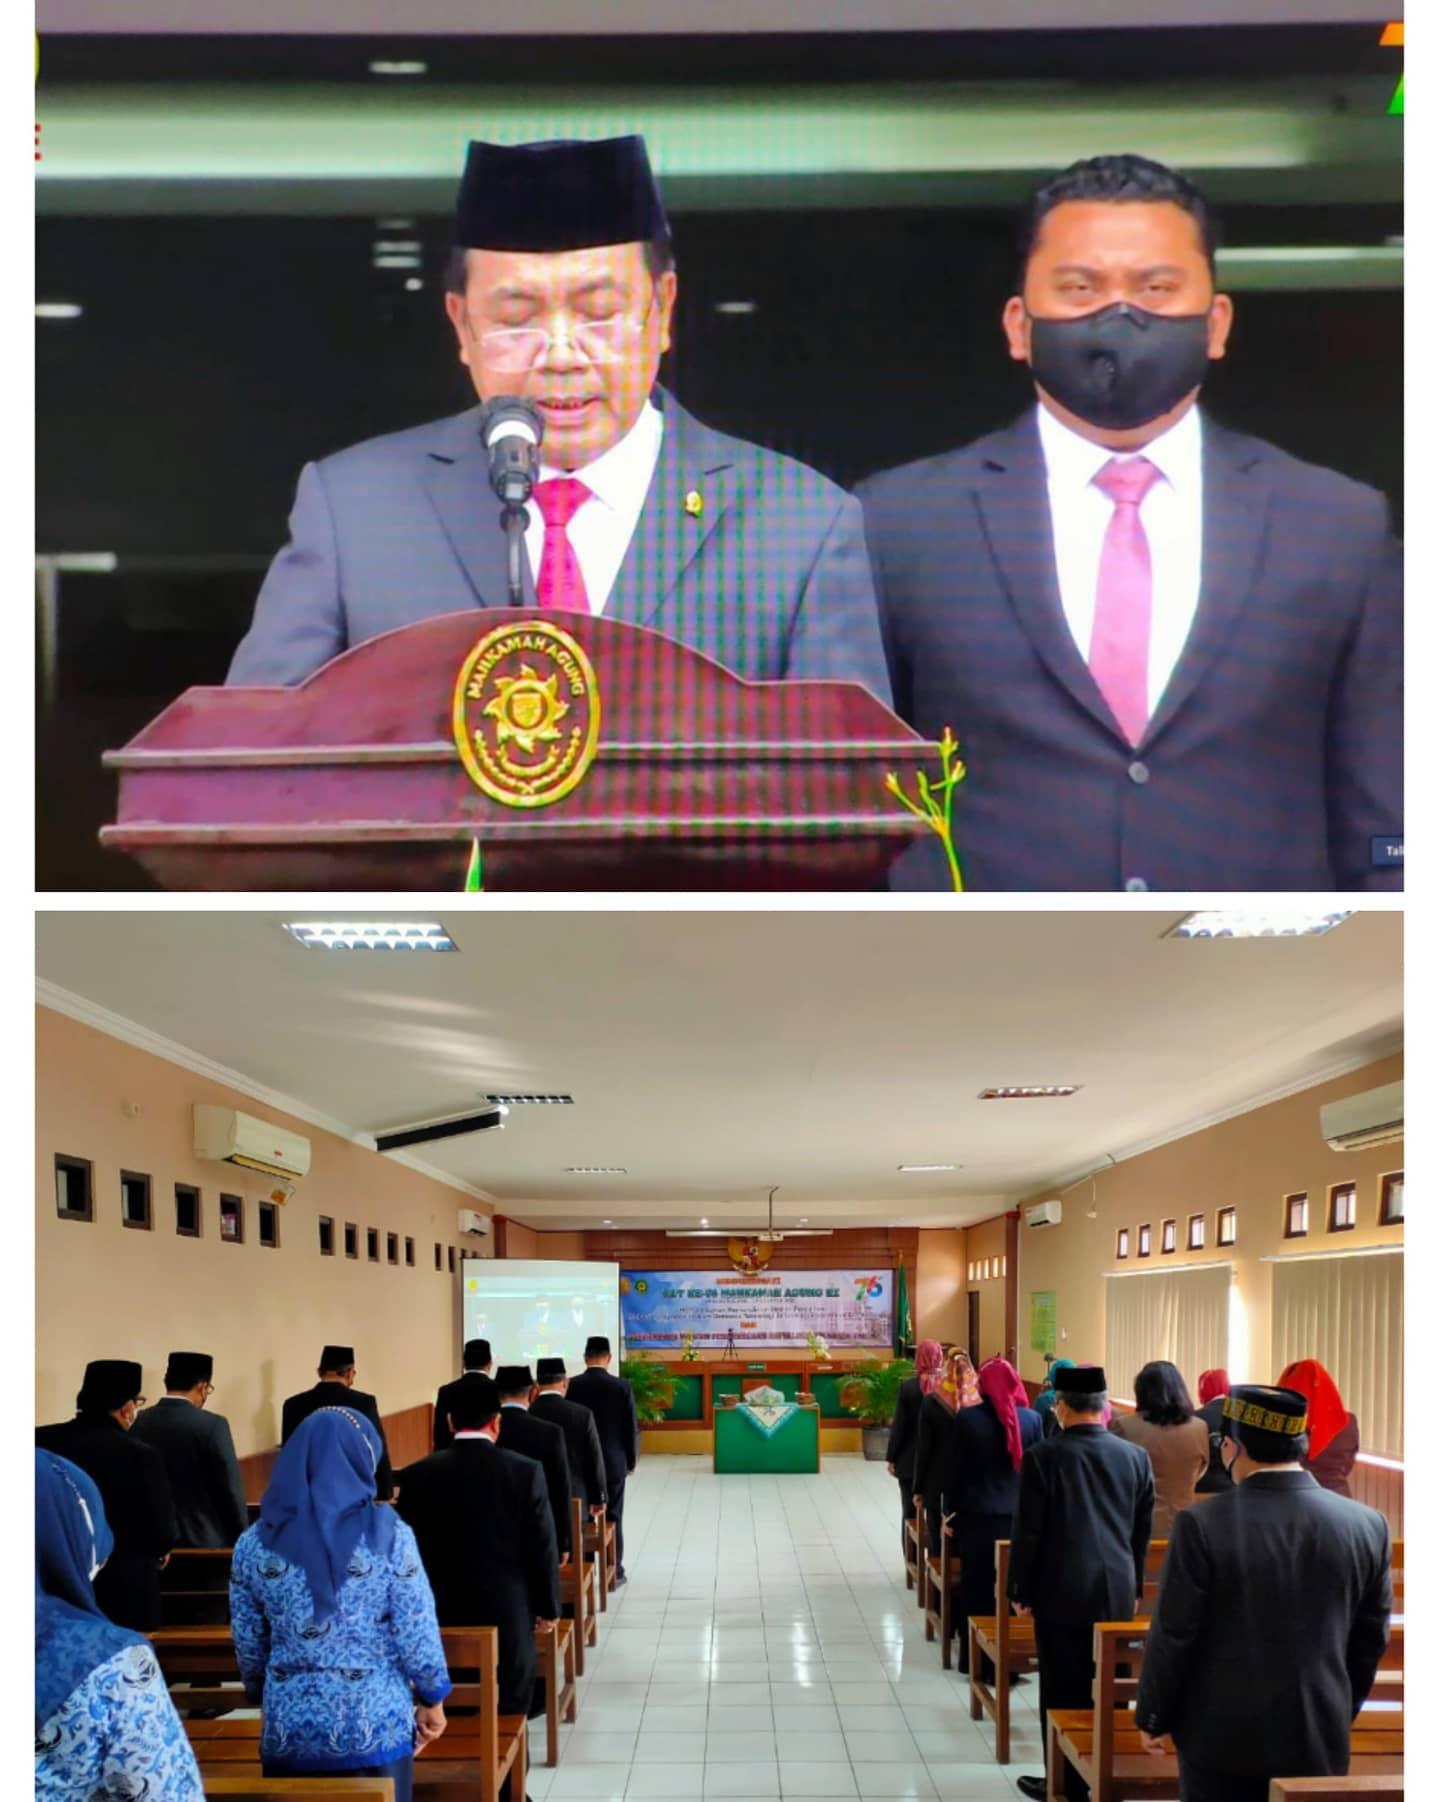 Rangkaian Acara Hari Ulang Tahun Mahkamah Agung Republik Indonesia yang Ke-76 Tahun